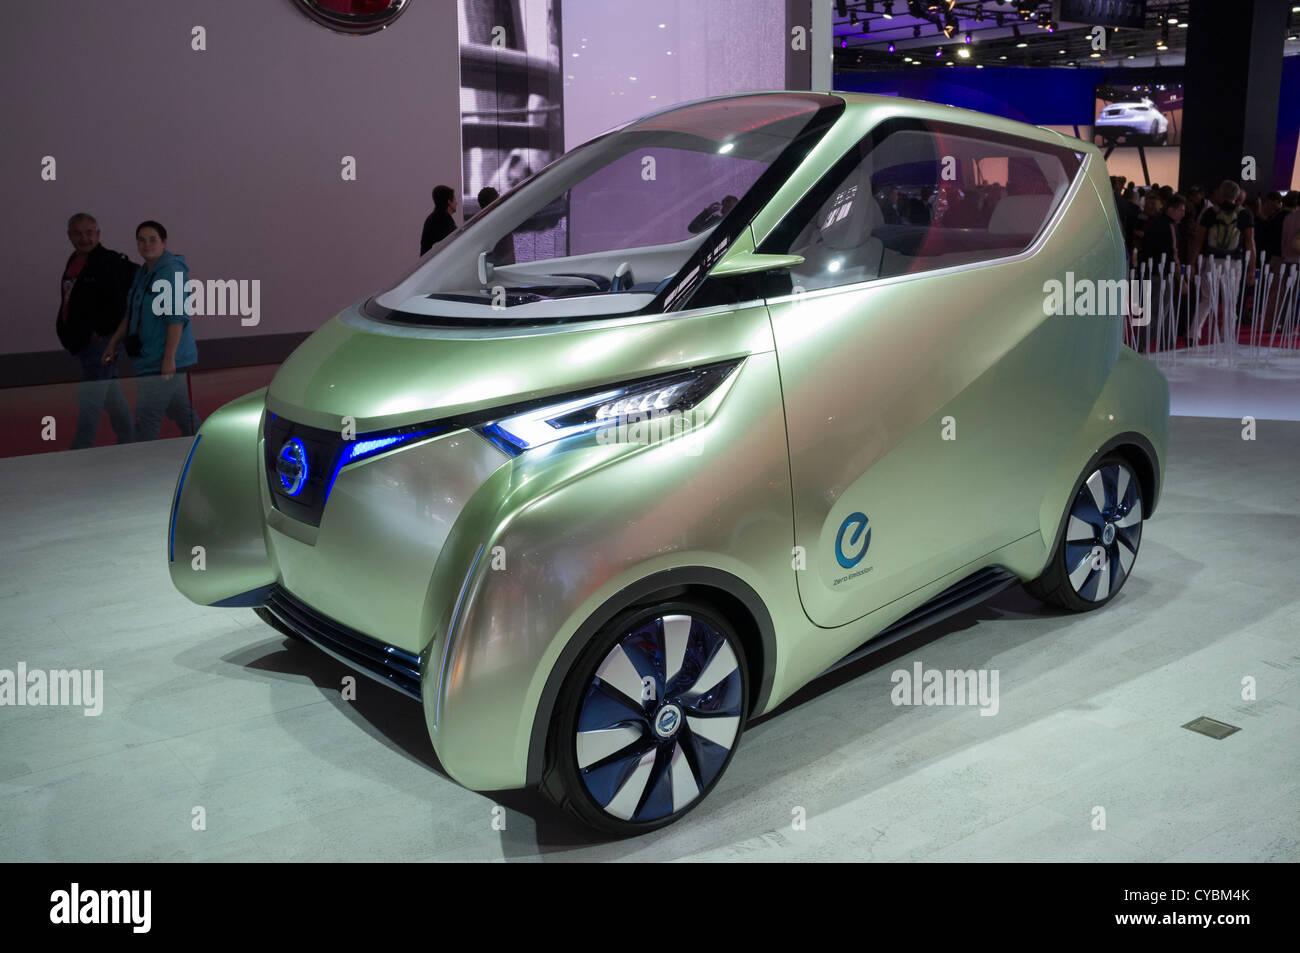 Nissan Pivo concept car eléctrico en Paris Motor Show 2012 Imagen De Stock